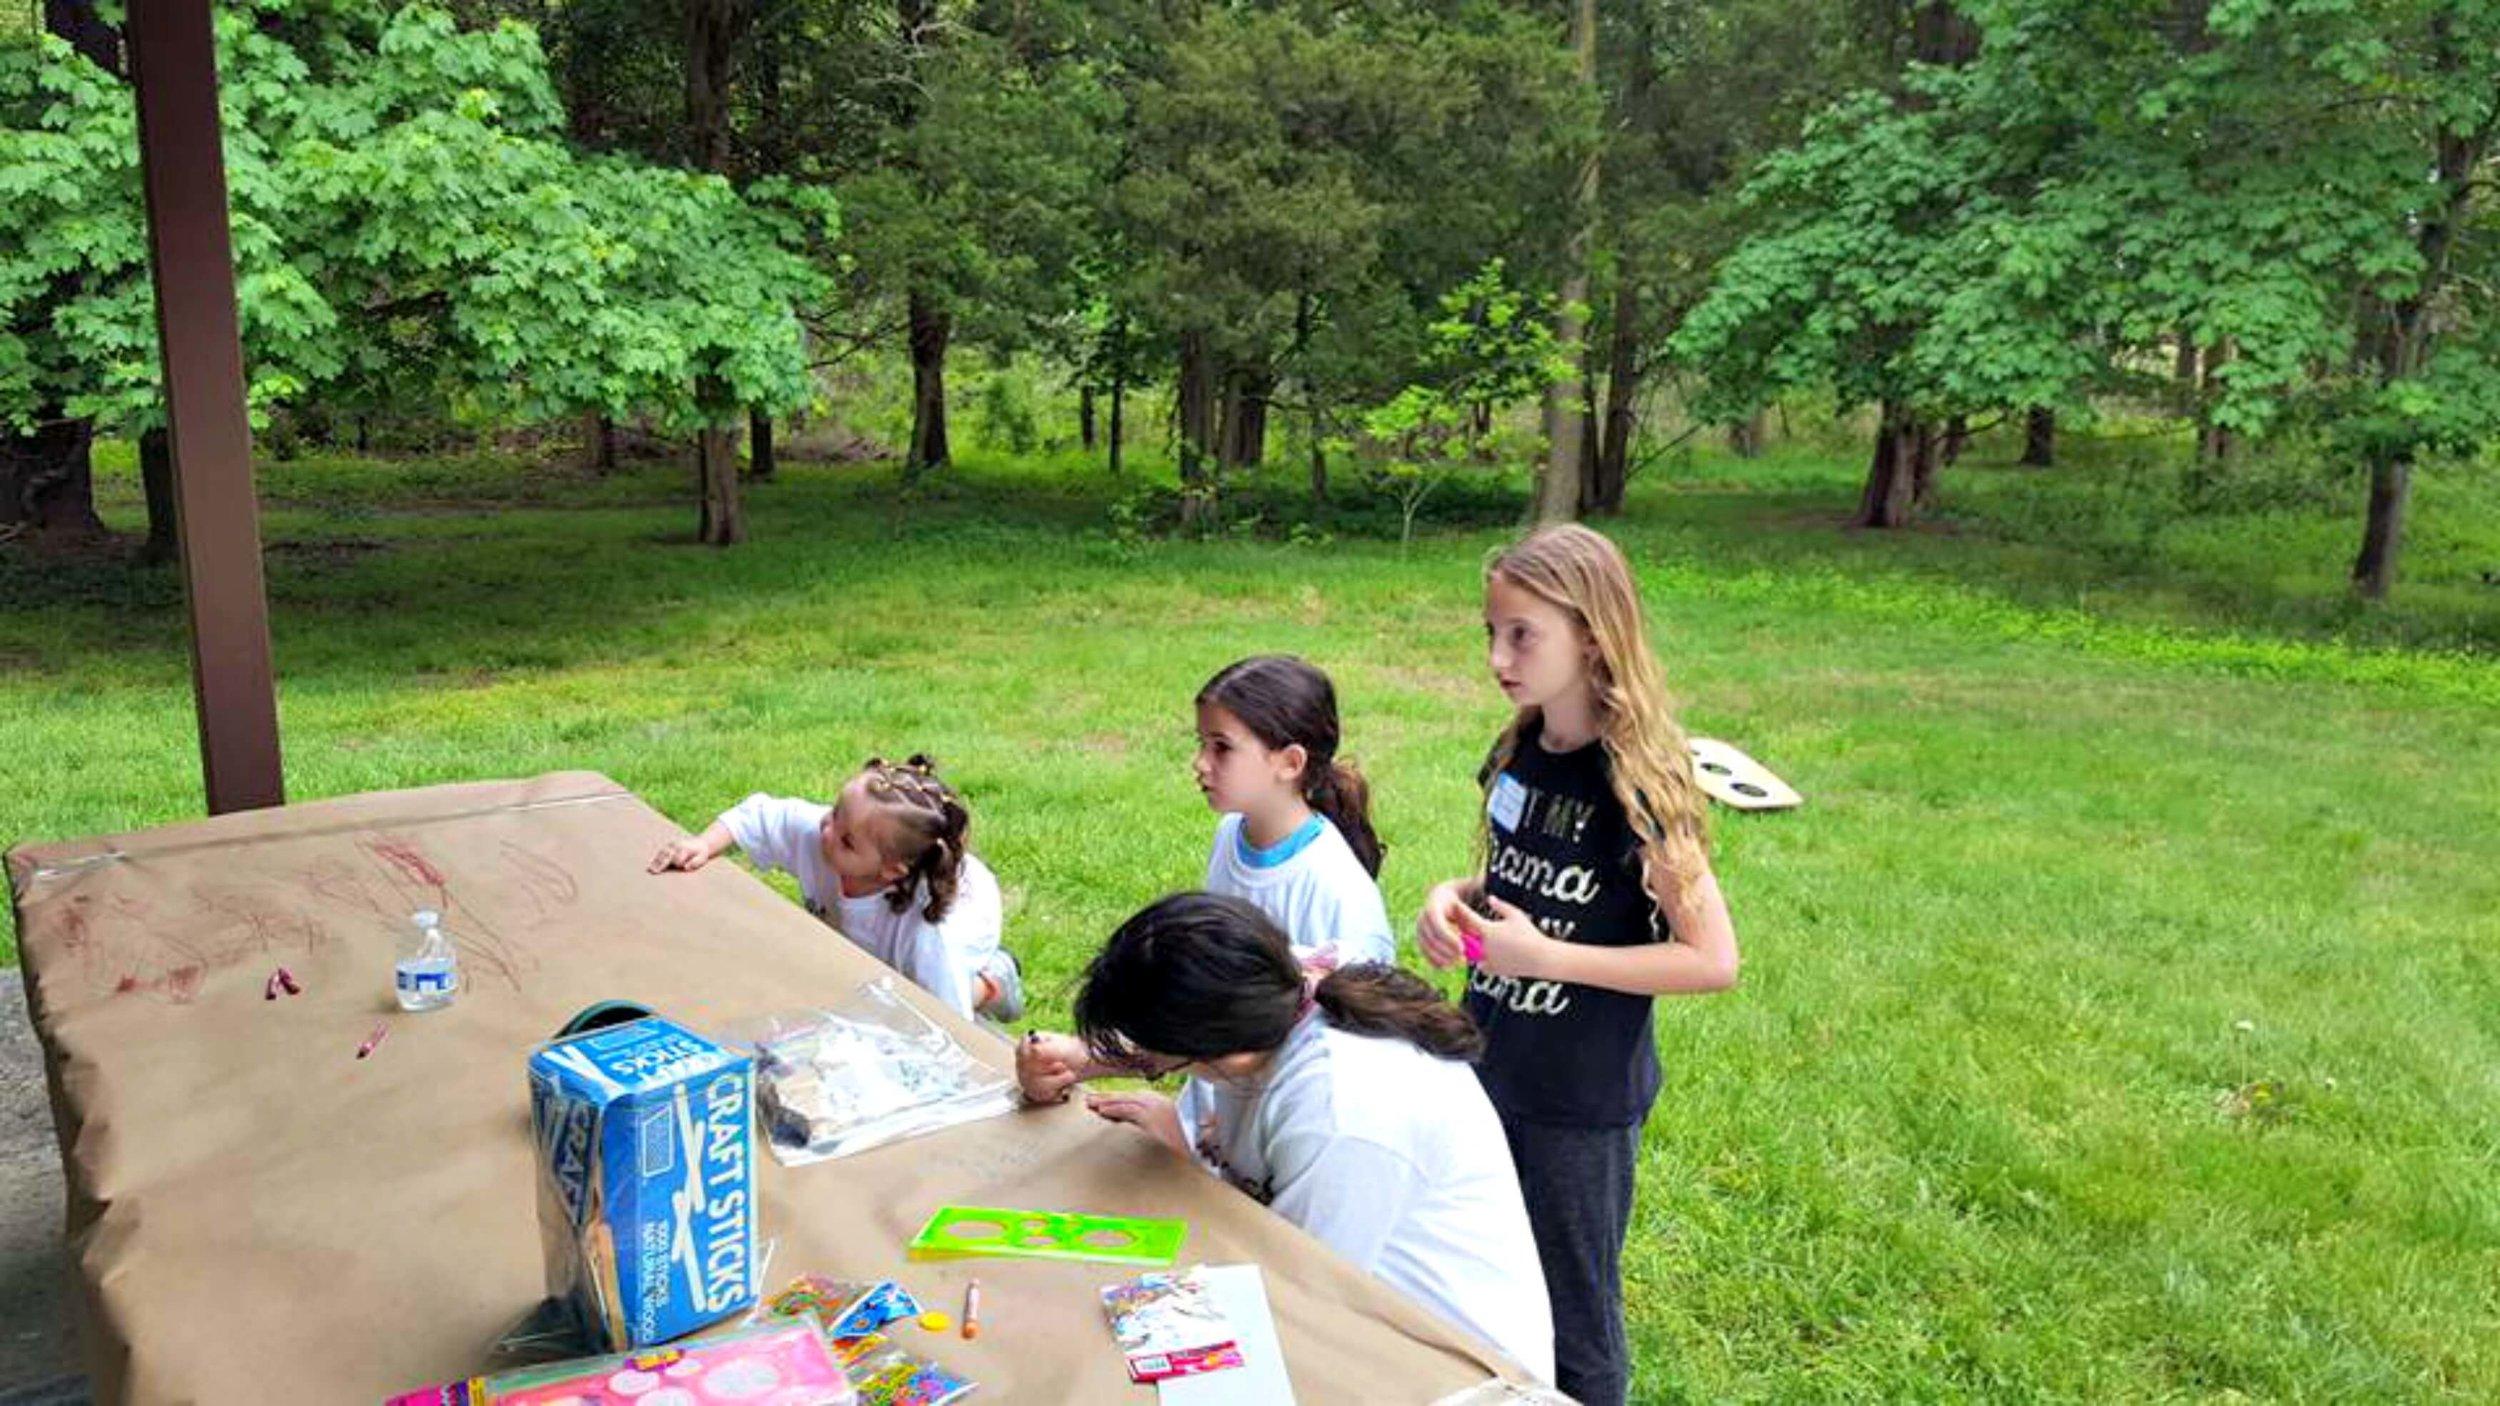 picnic17_92.jpg